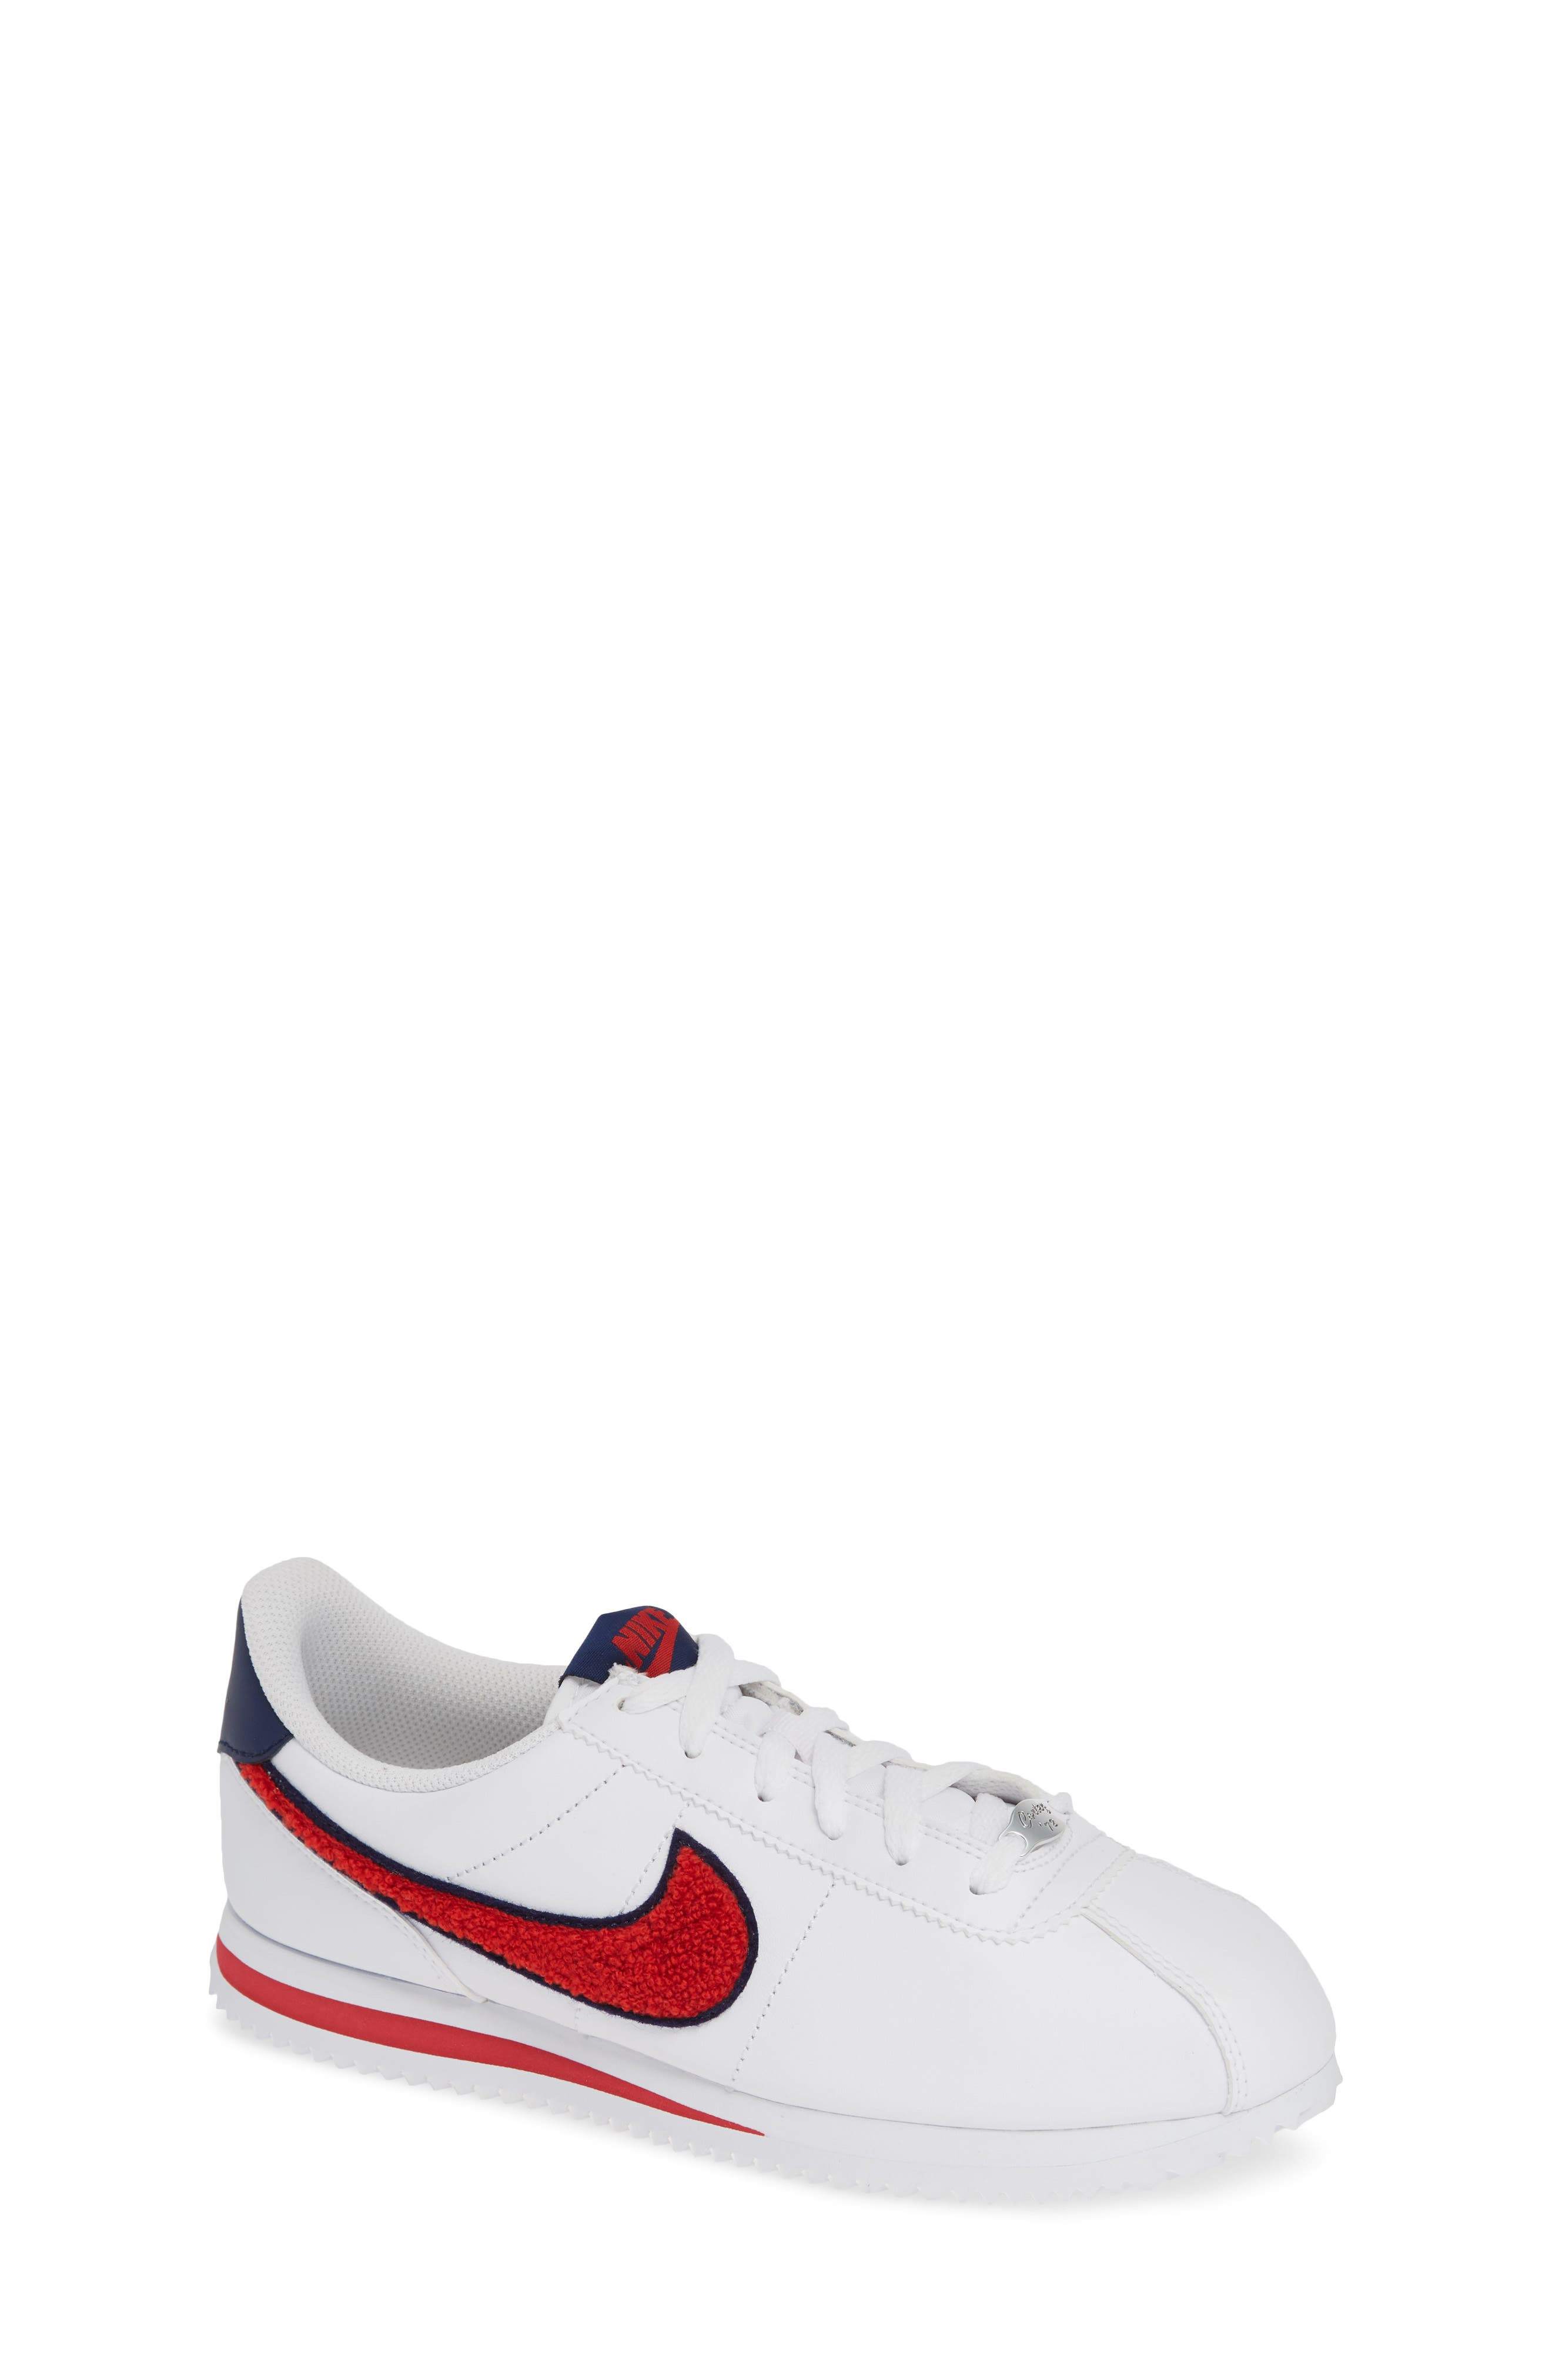 Cortez Basic SE Sneaker,                         Main,                         color, WHITE/ UNIVERSITY RED/ BLUE